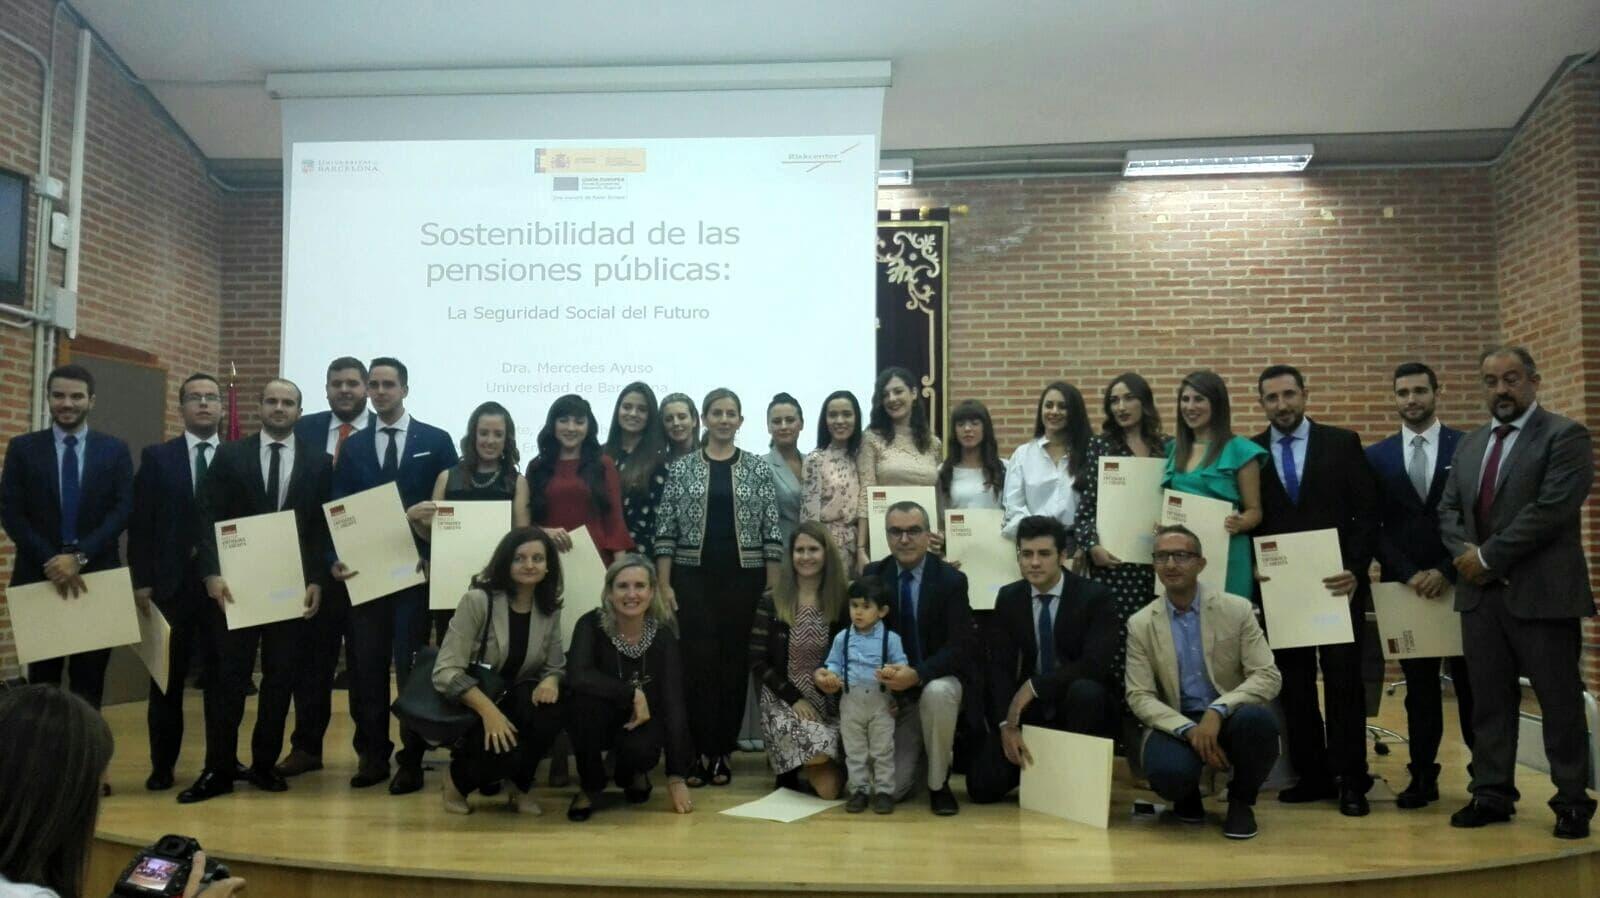 https://blog.globalcaja.es/wp-content/uploads/2017/10/clausura-master-entidades-de-credito.jpg